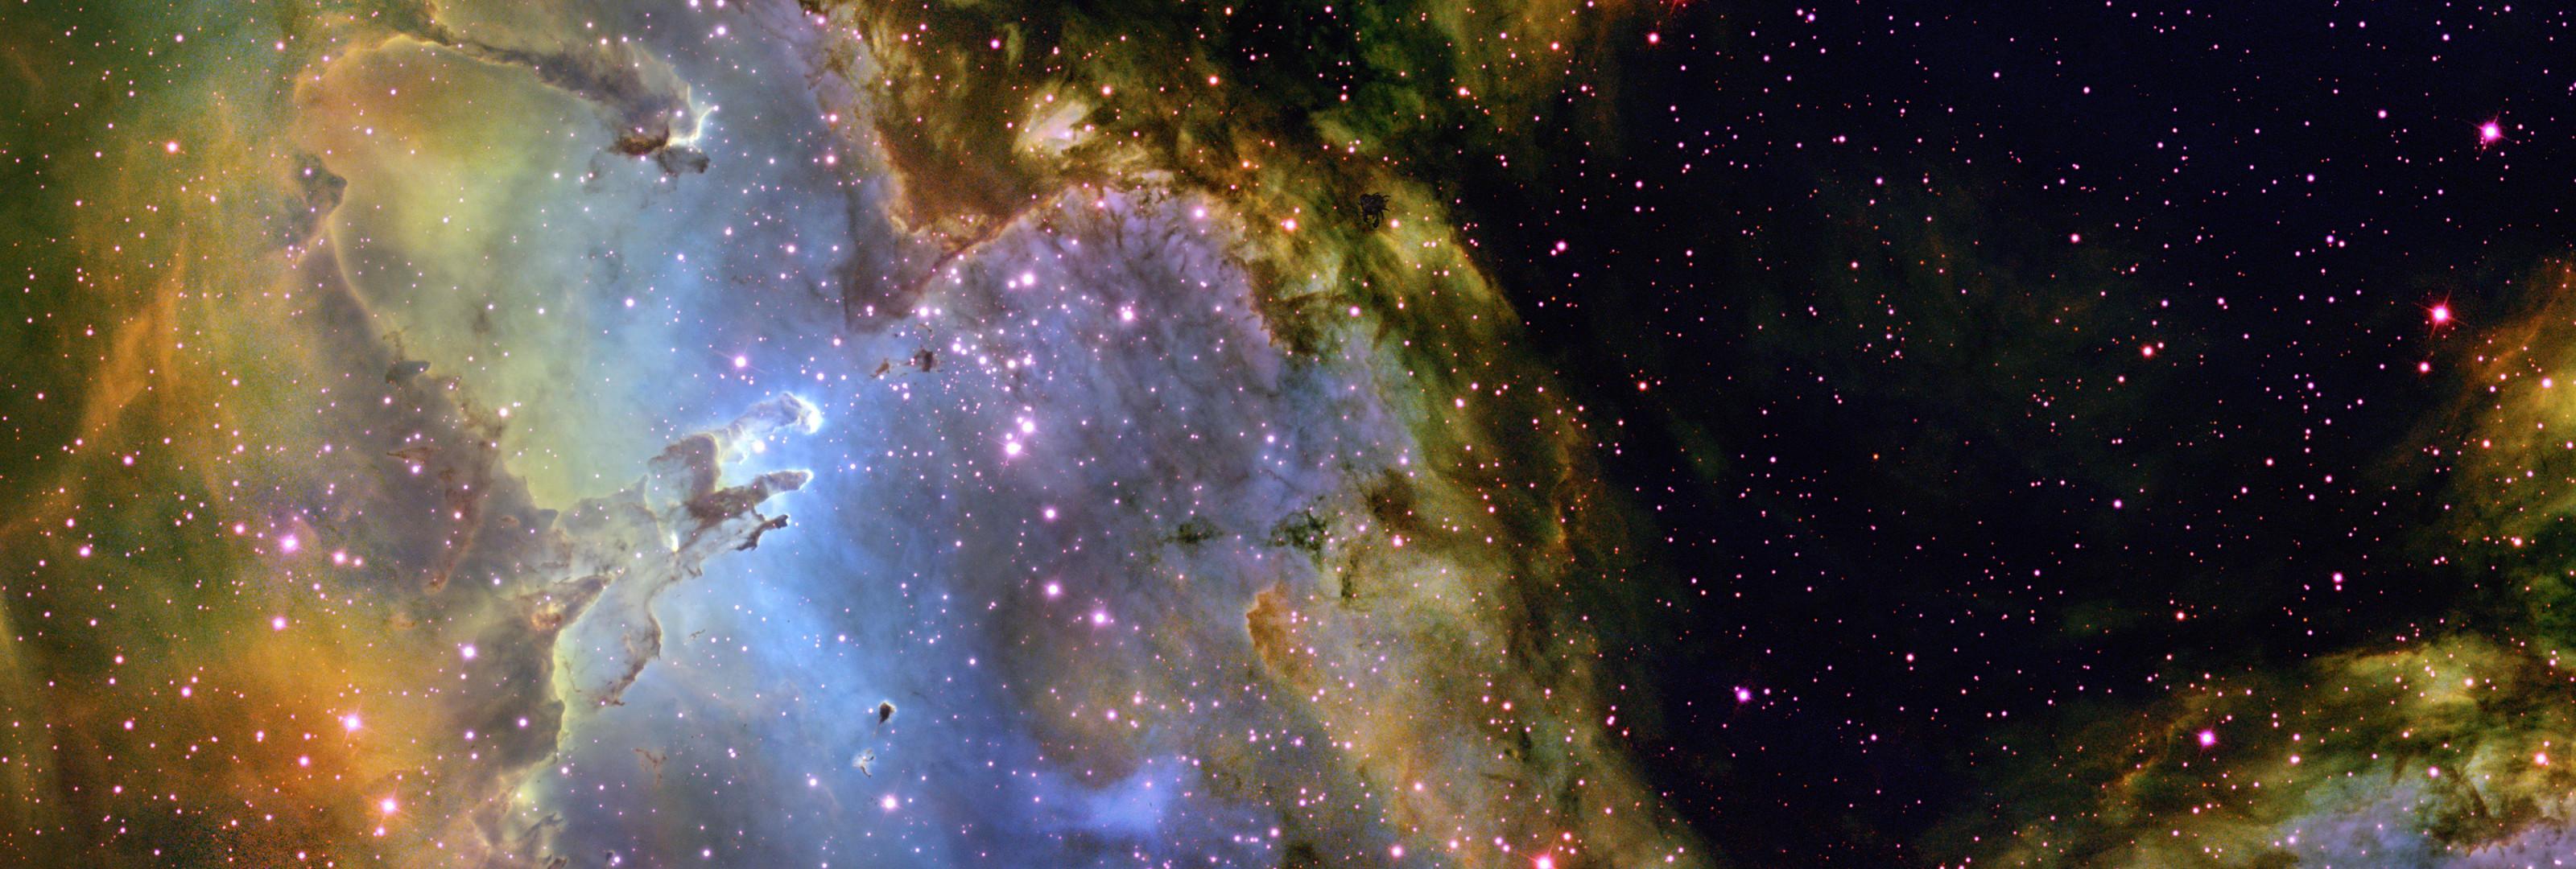 … adamantpieeater Eagle Nebula Wallpaper 3200 X 1080 by adamantpieeater